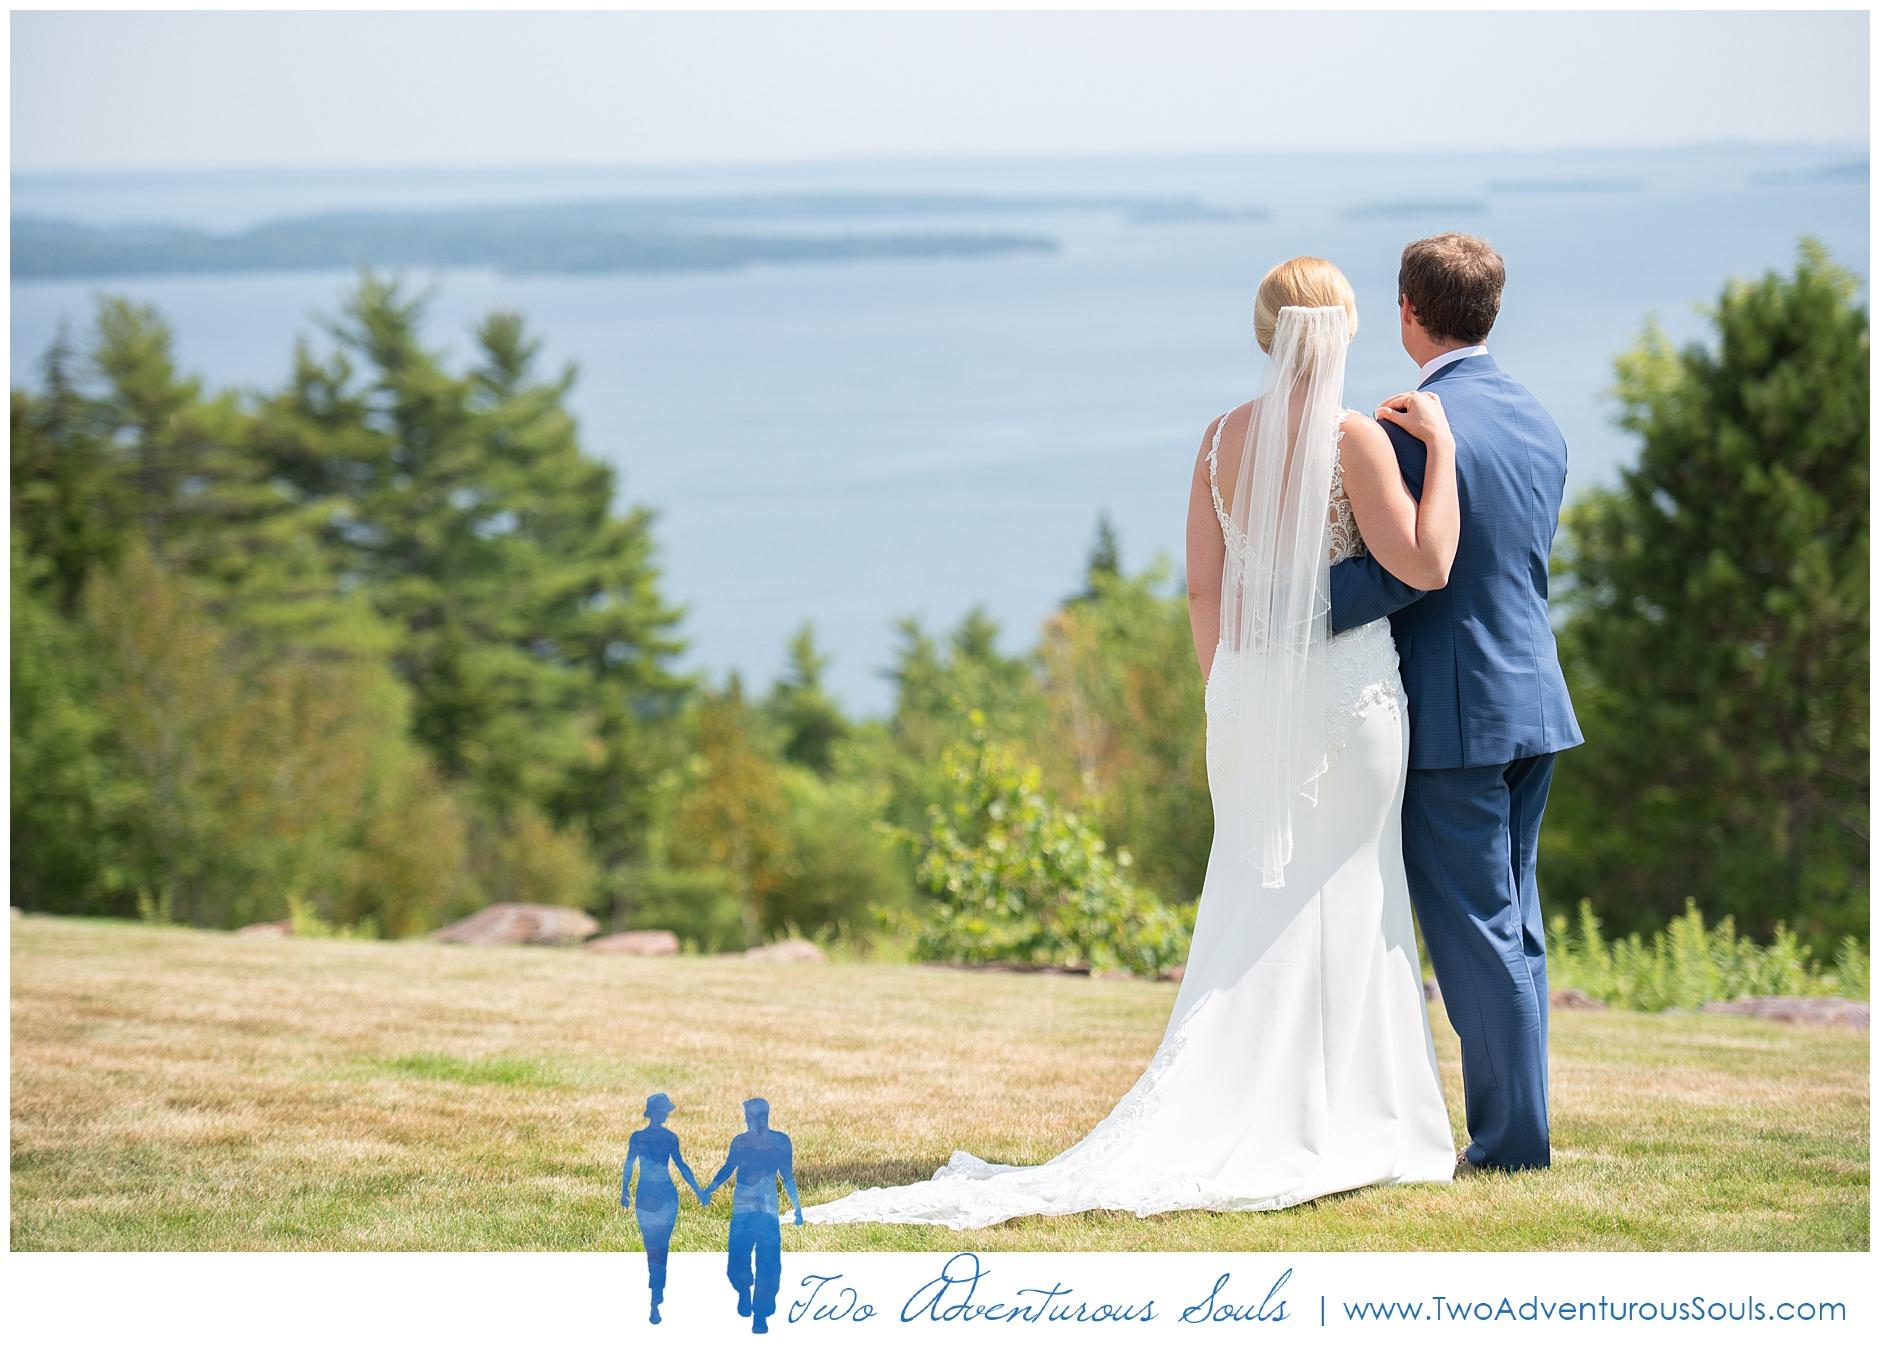 Maine Wedding Photographers, Point Lookout Wedding Photographers, Maine Elopement Photographers, Two Adventurous Souls-0080419_0024.jpg